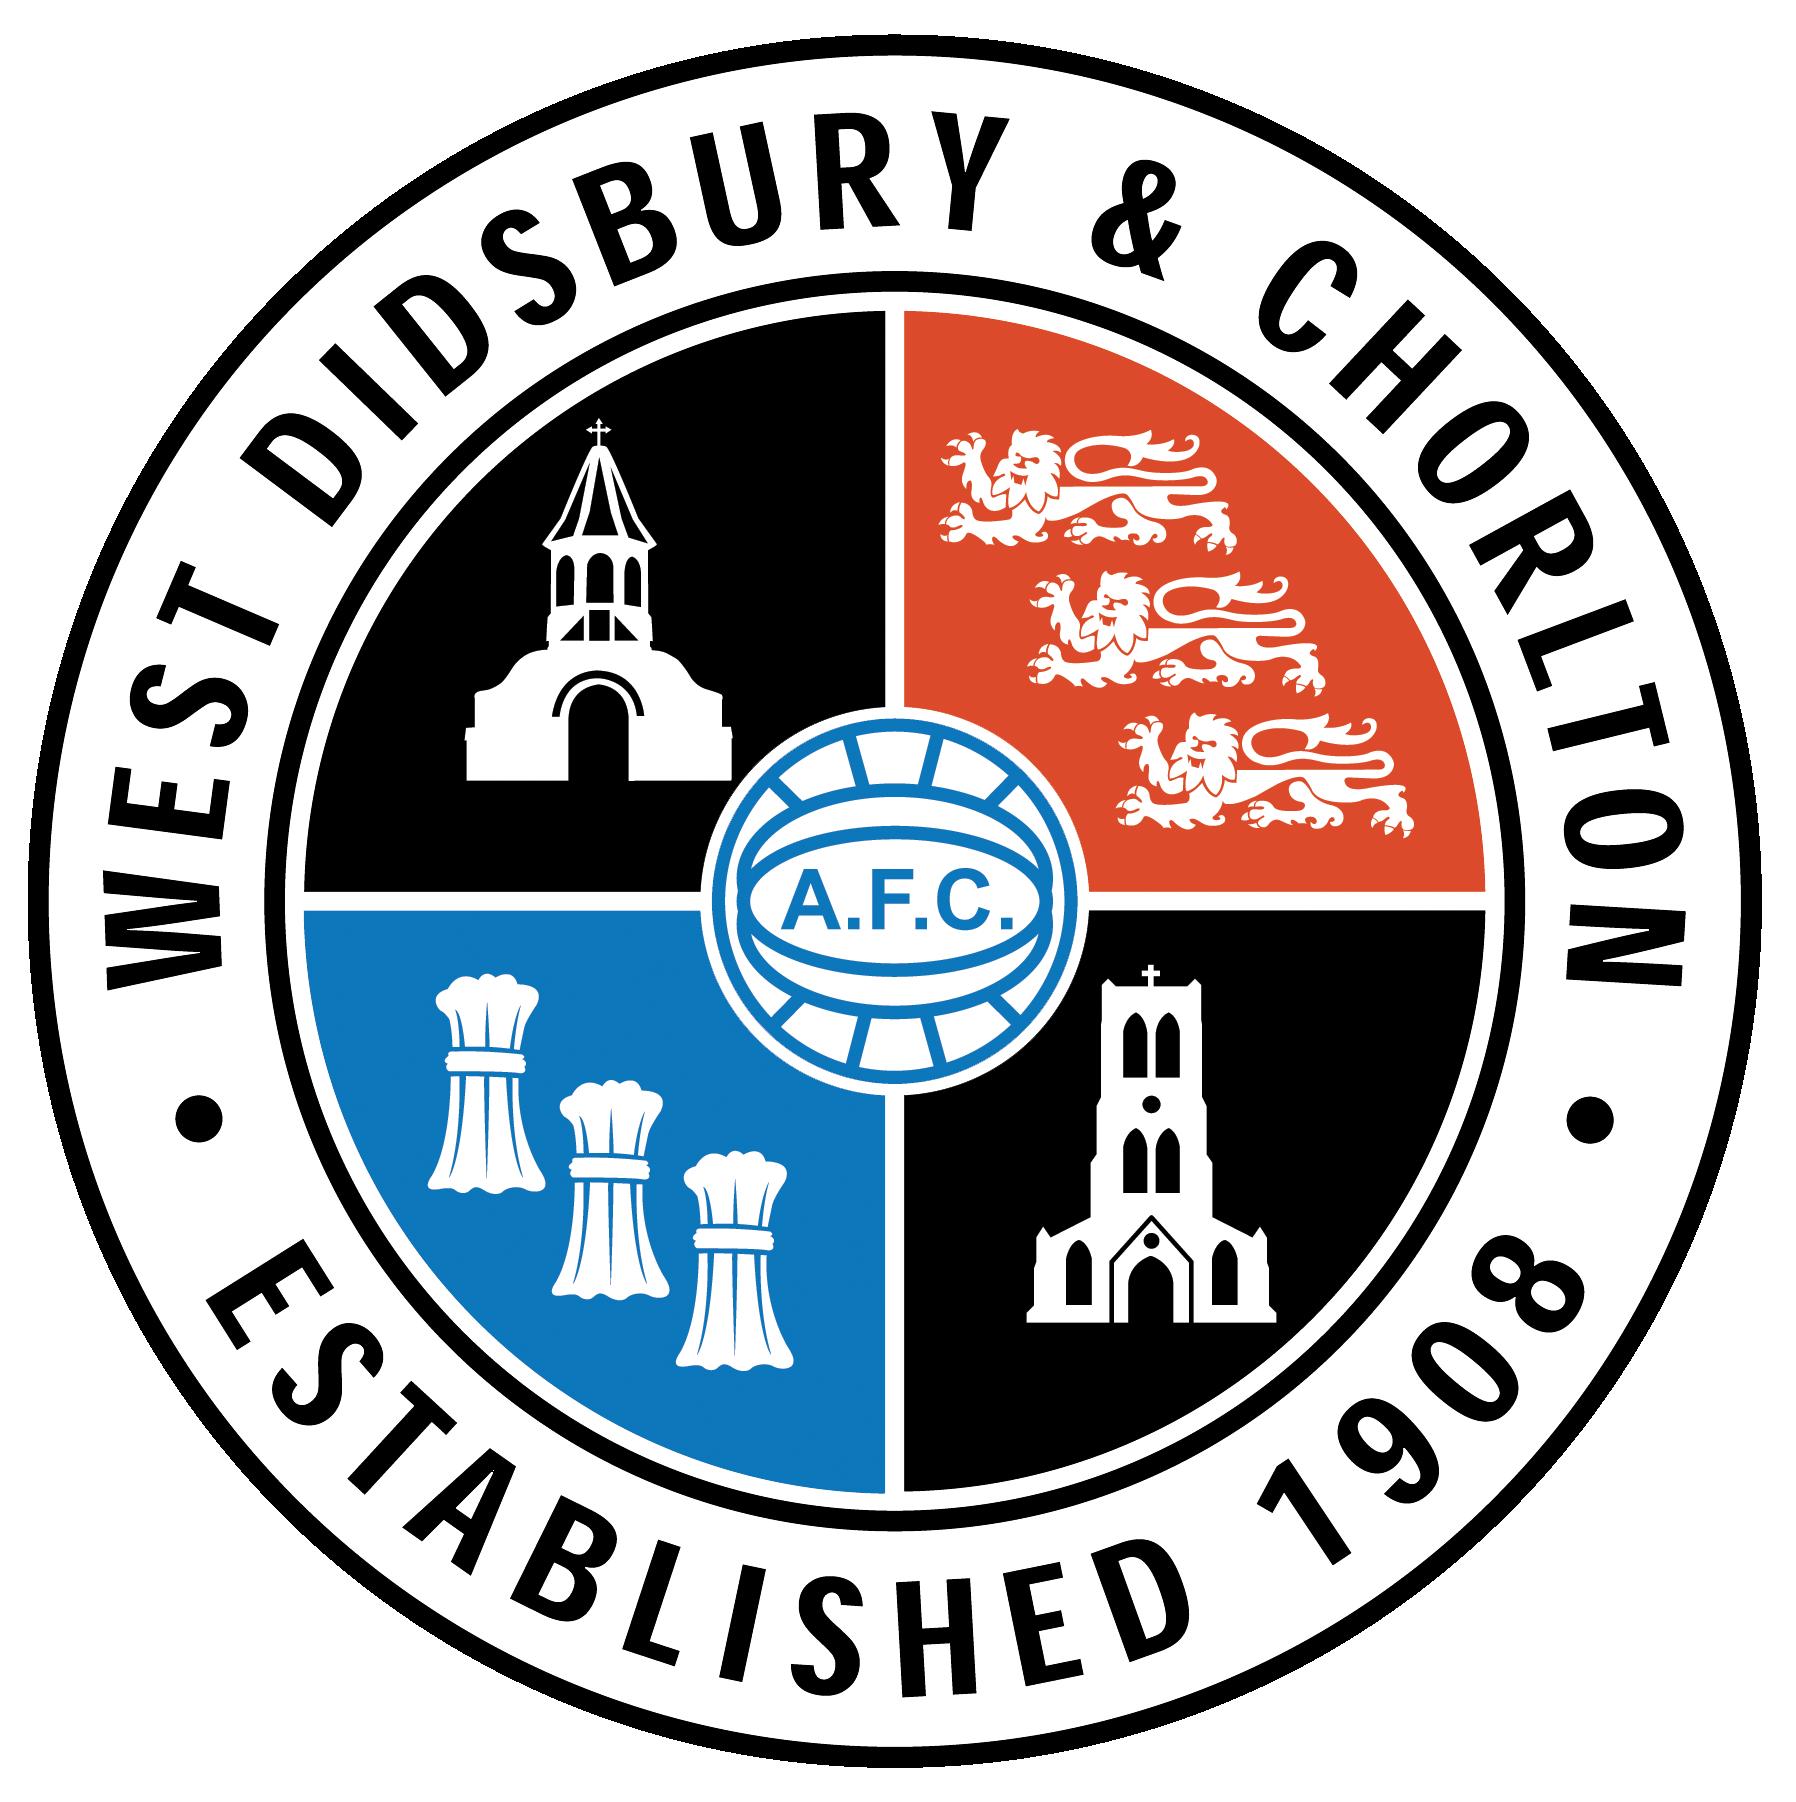 West Didsbury & Chorlton Women's FC badge